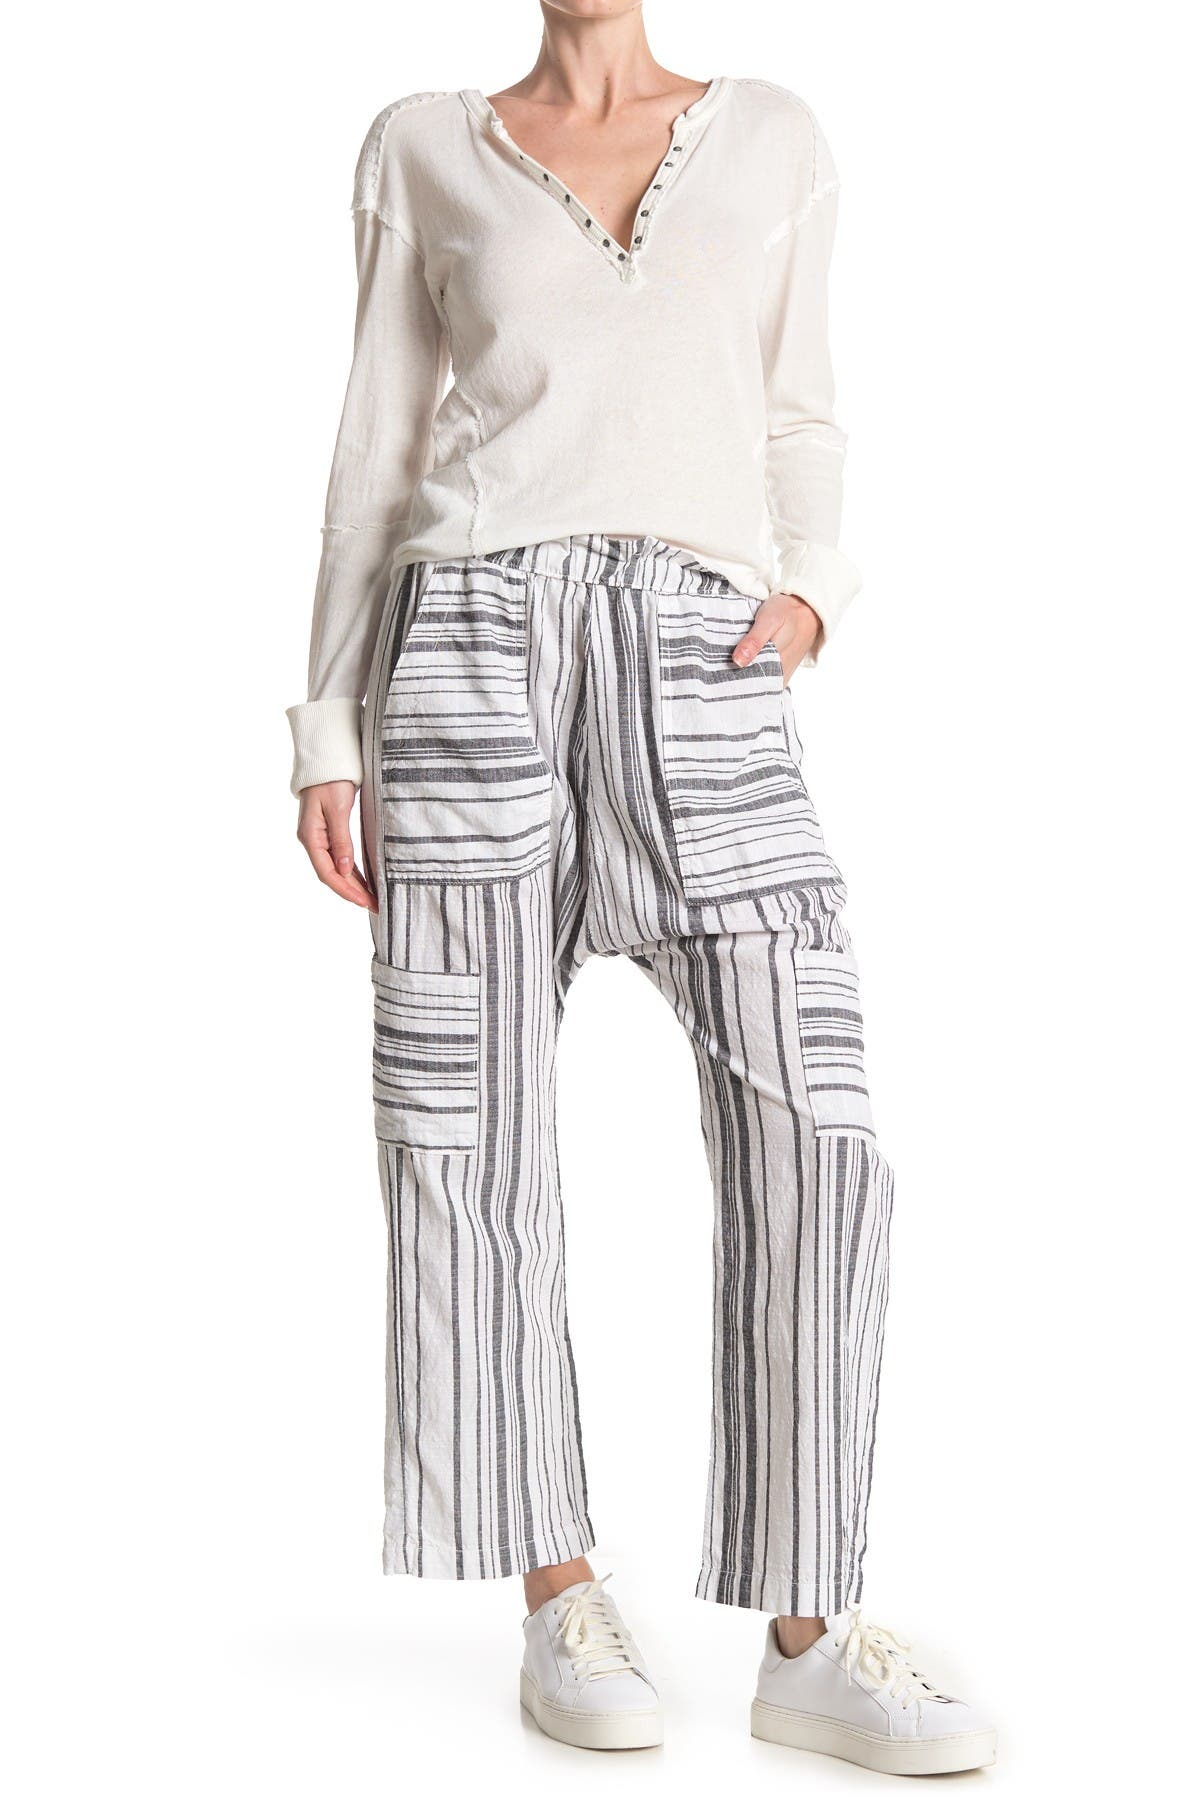 Image of NSF CLOTHING Shailey Paperbag Waist Pants